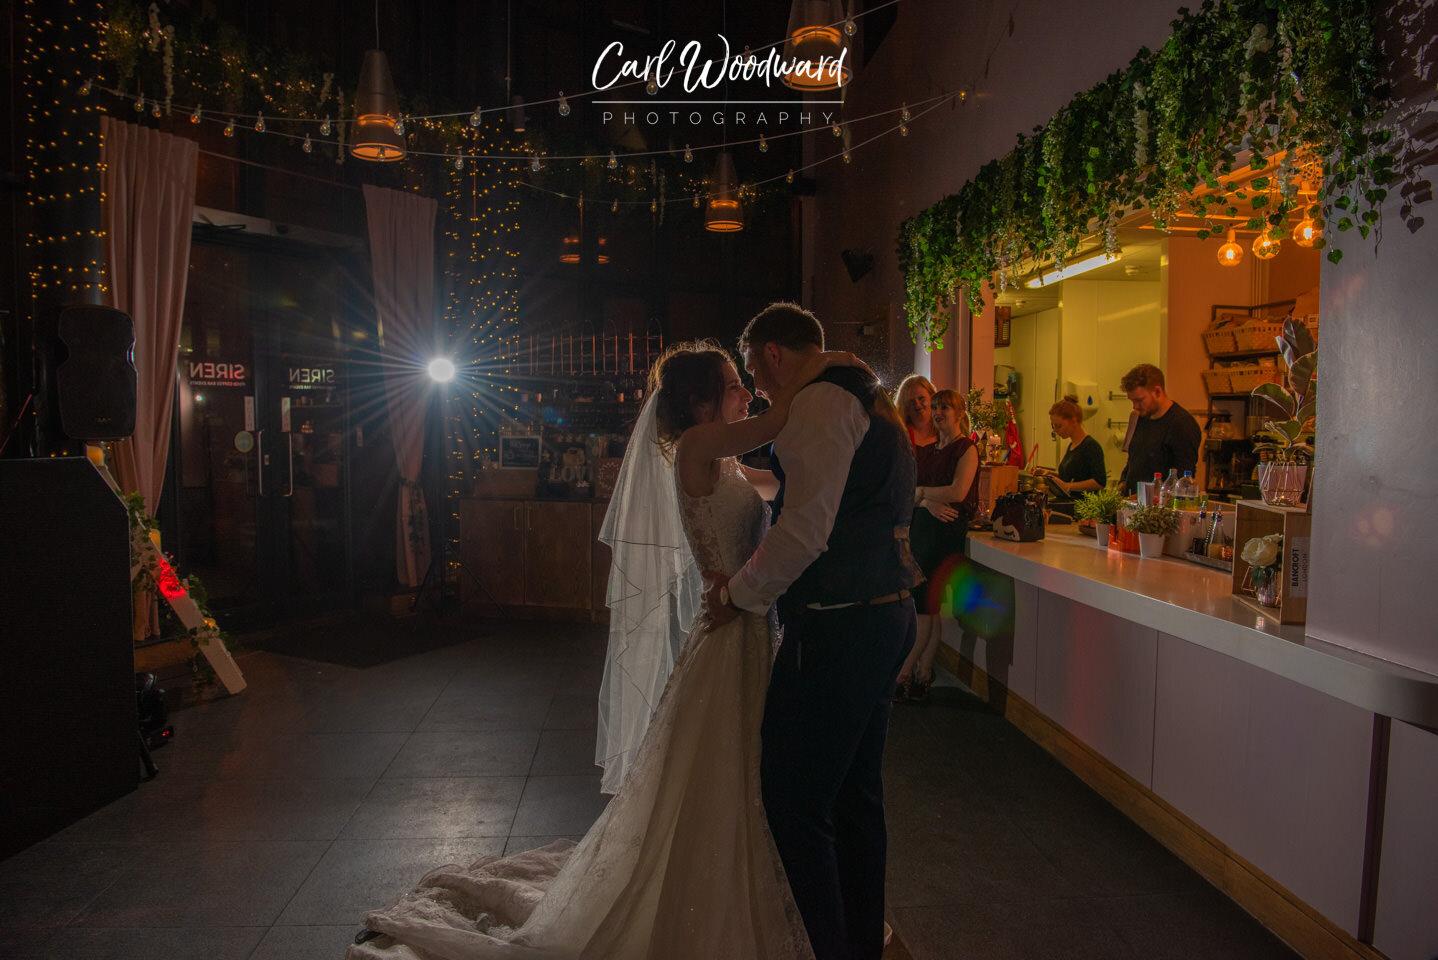 016-Siren-Liverpool-Wedding-Photos.jpg